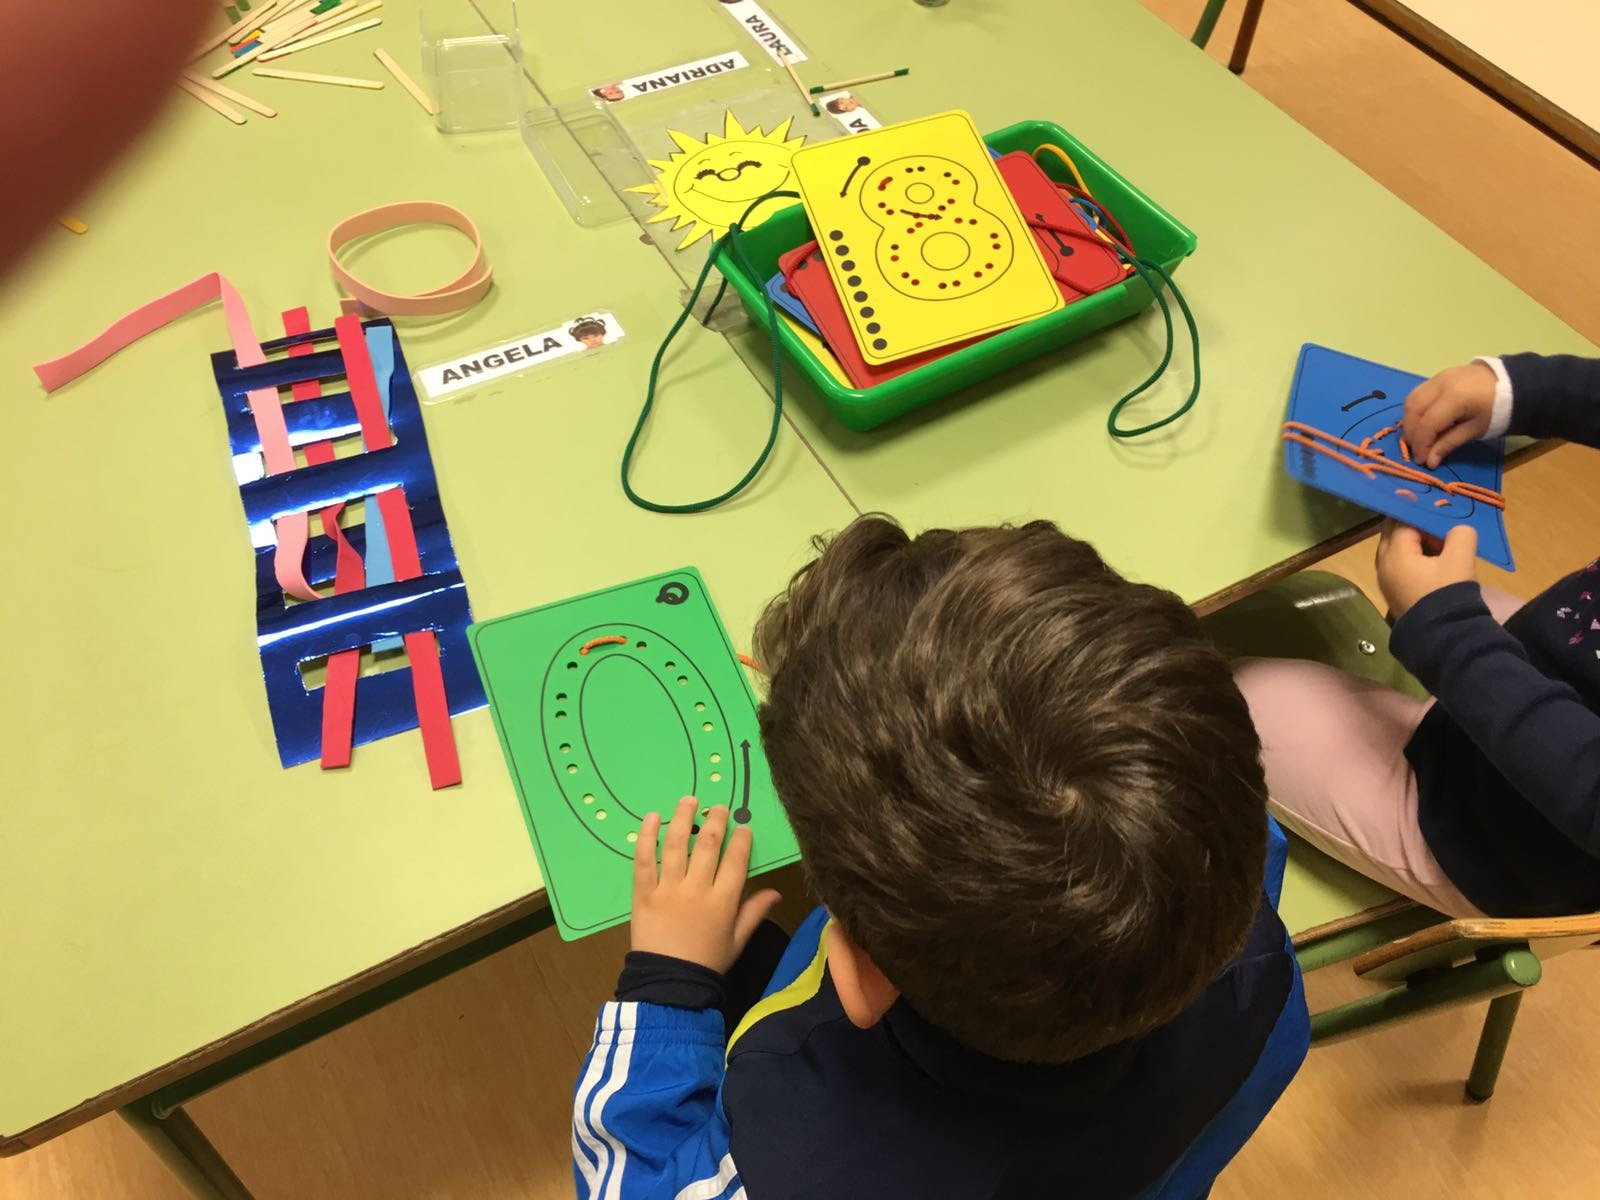 E. Infantil y sus proyectos 4